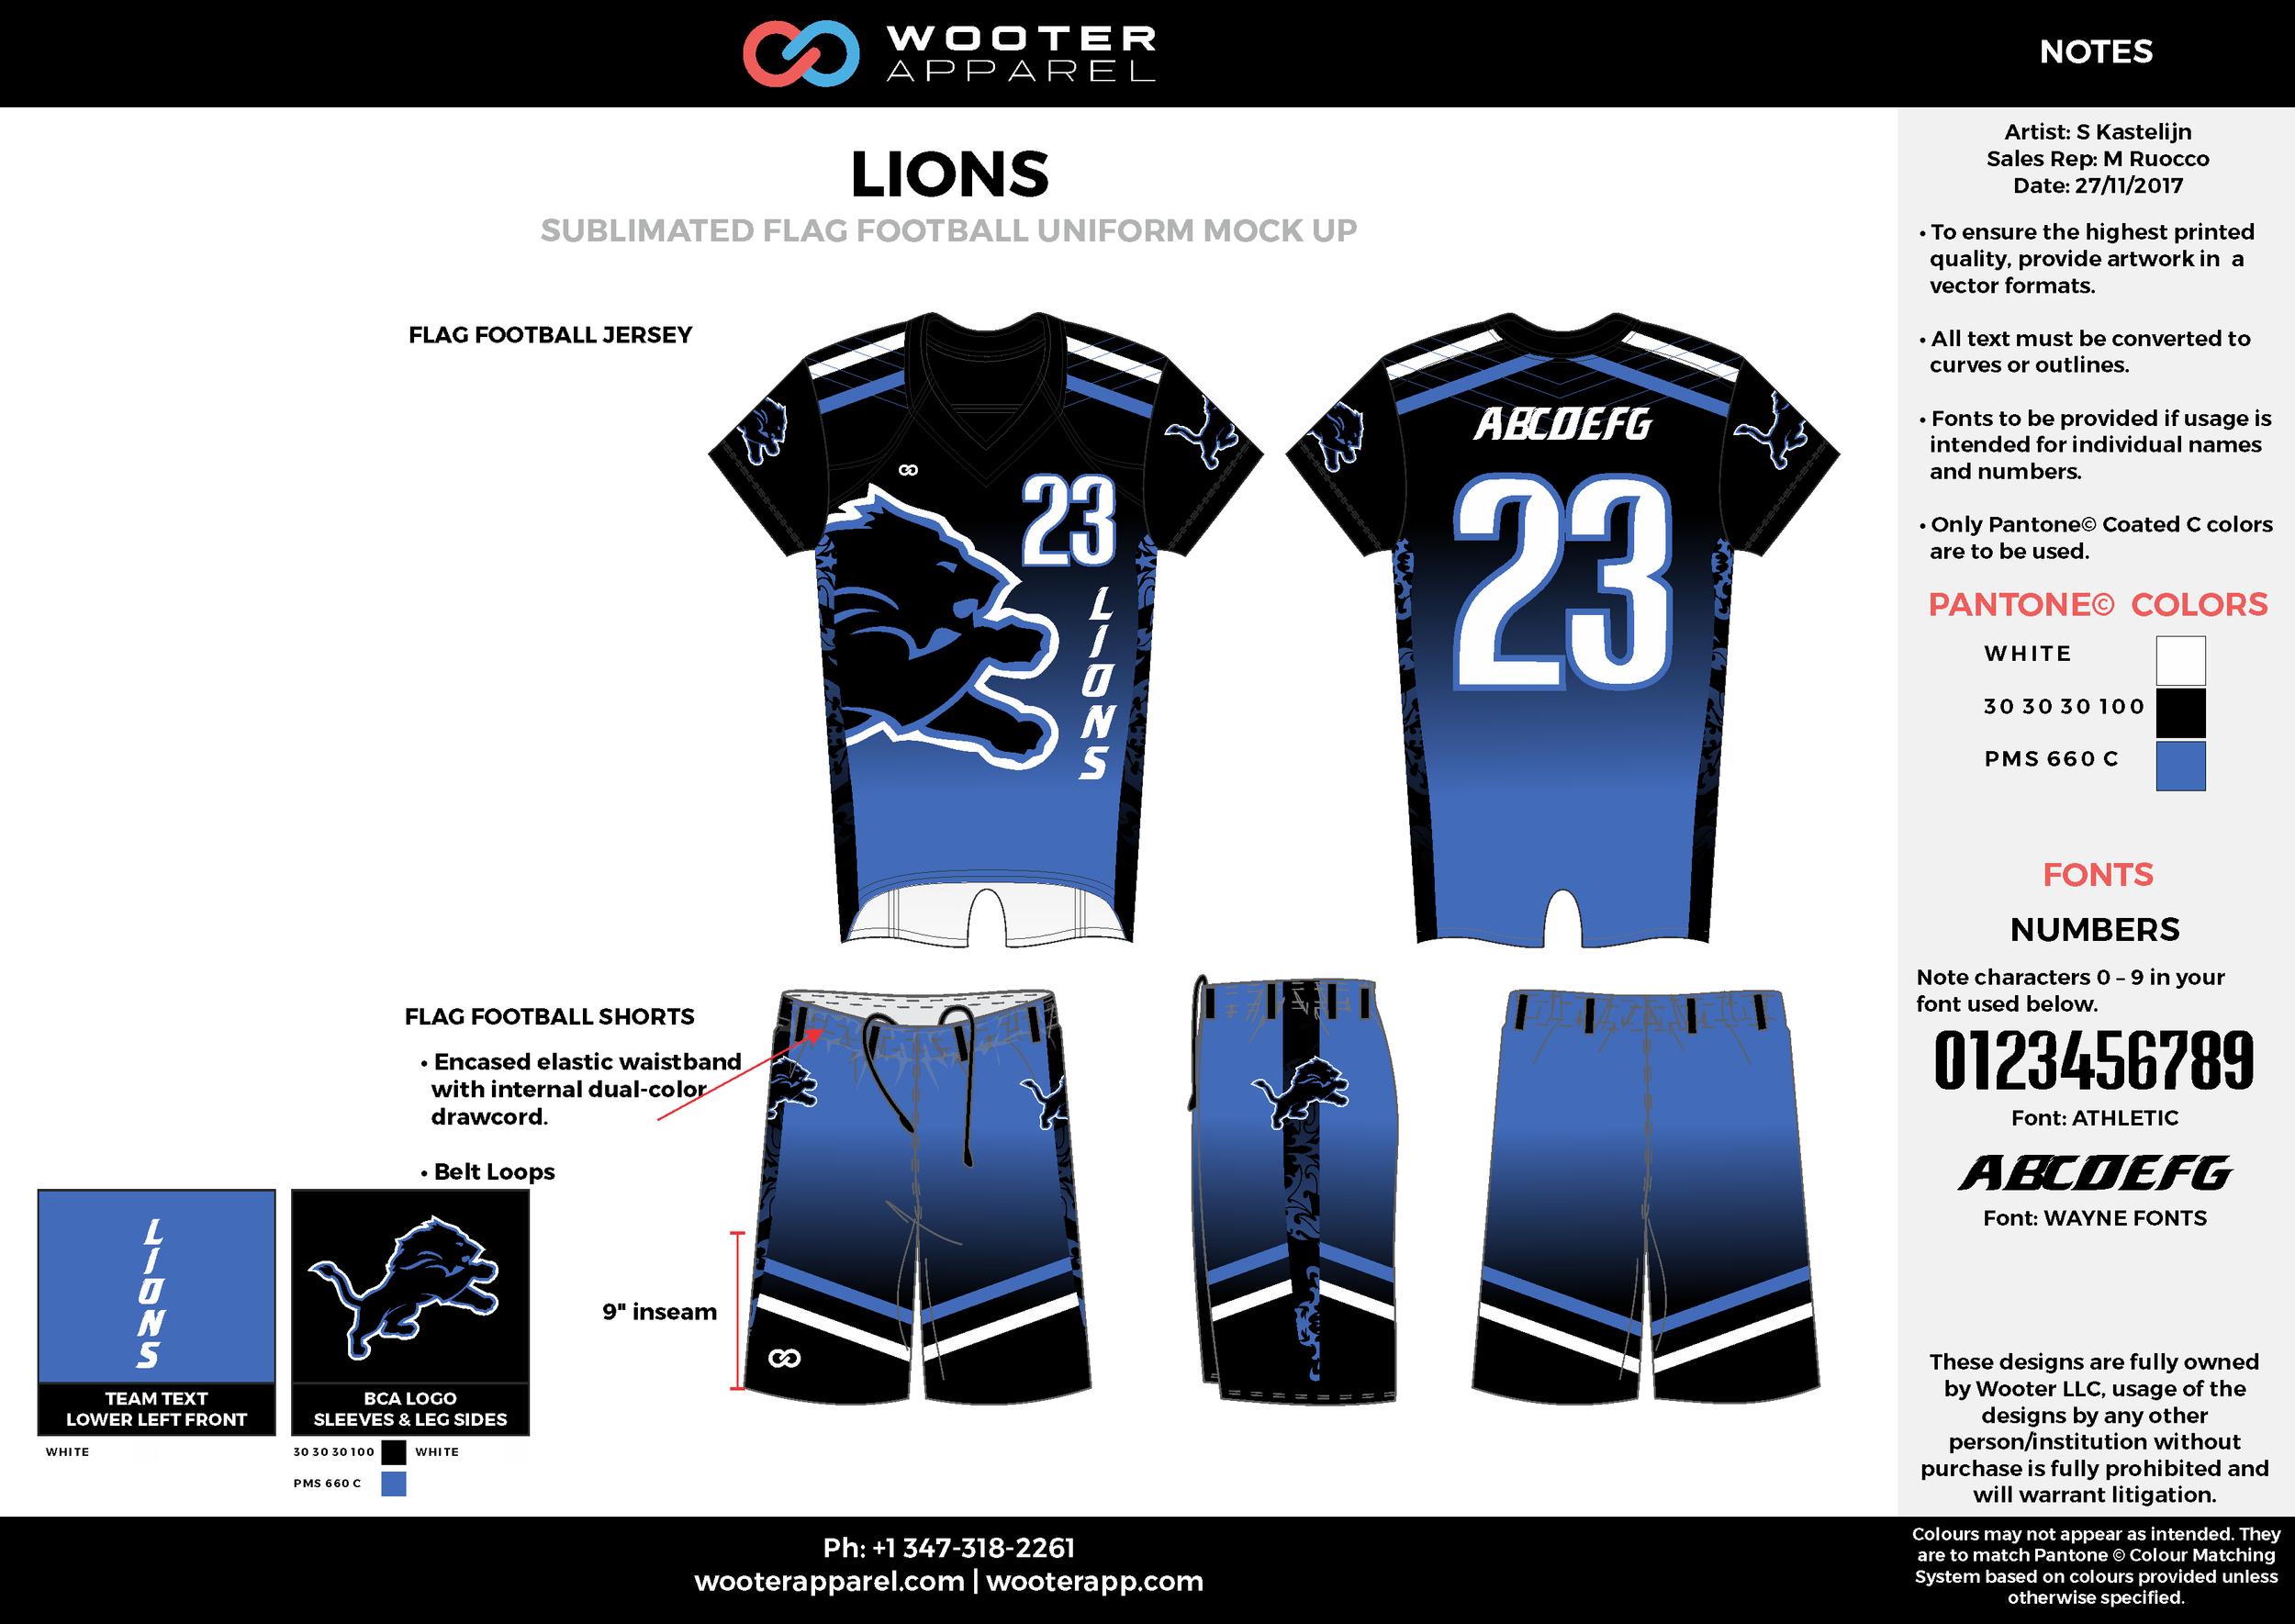 LIONS blue black white flag football uniforms jerseys shorts